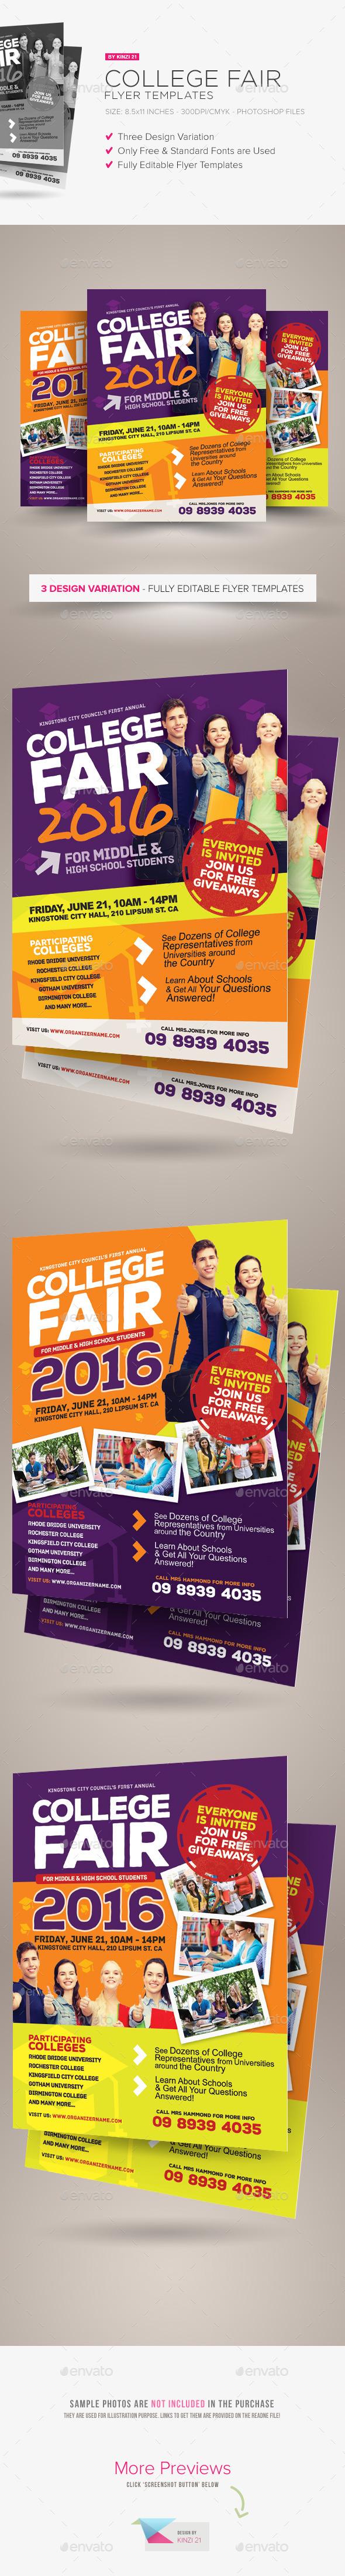 college fair flyer templates flyers flyer template and colleges college fair flyer templates